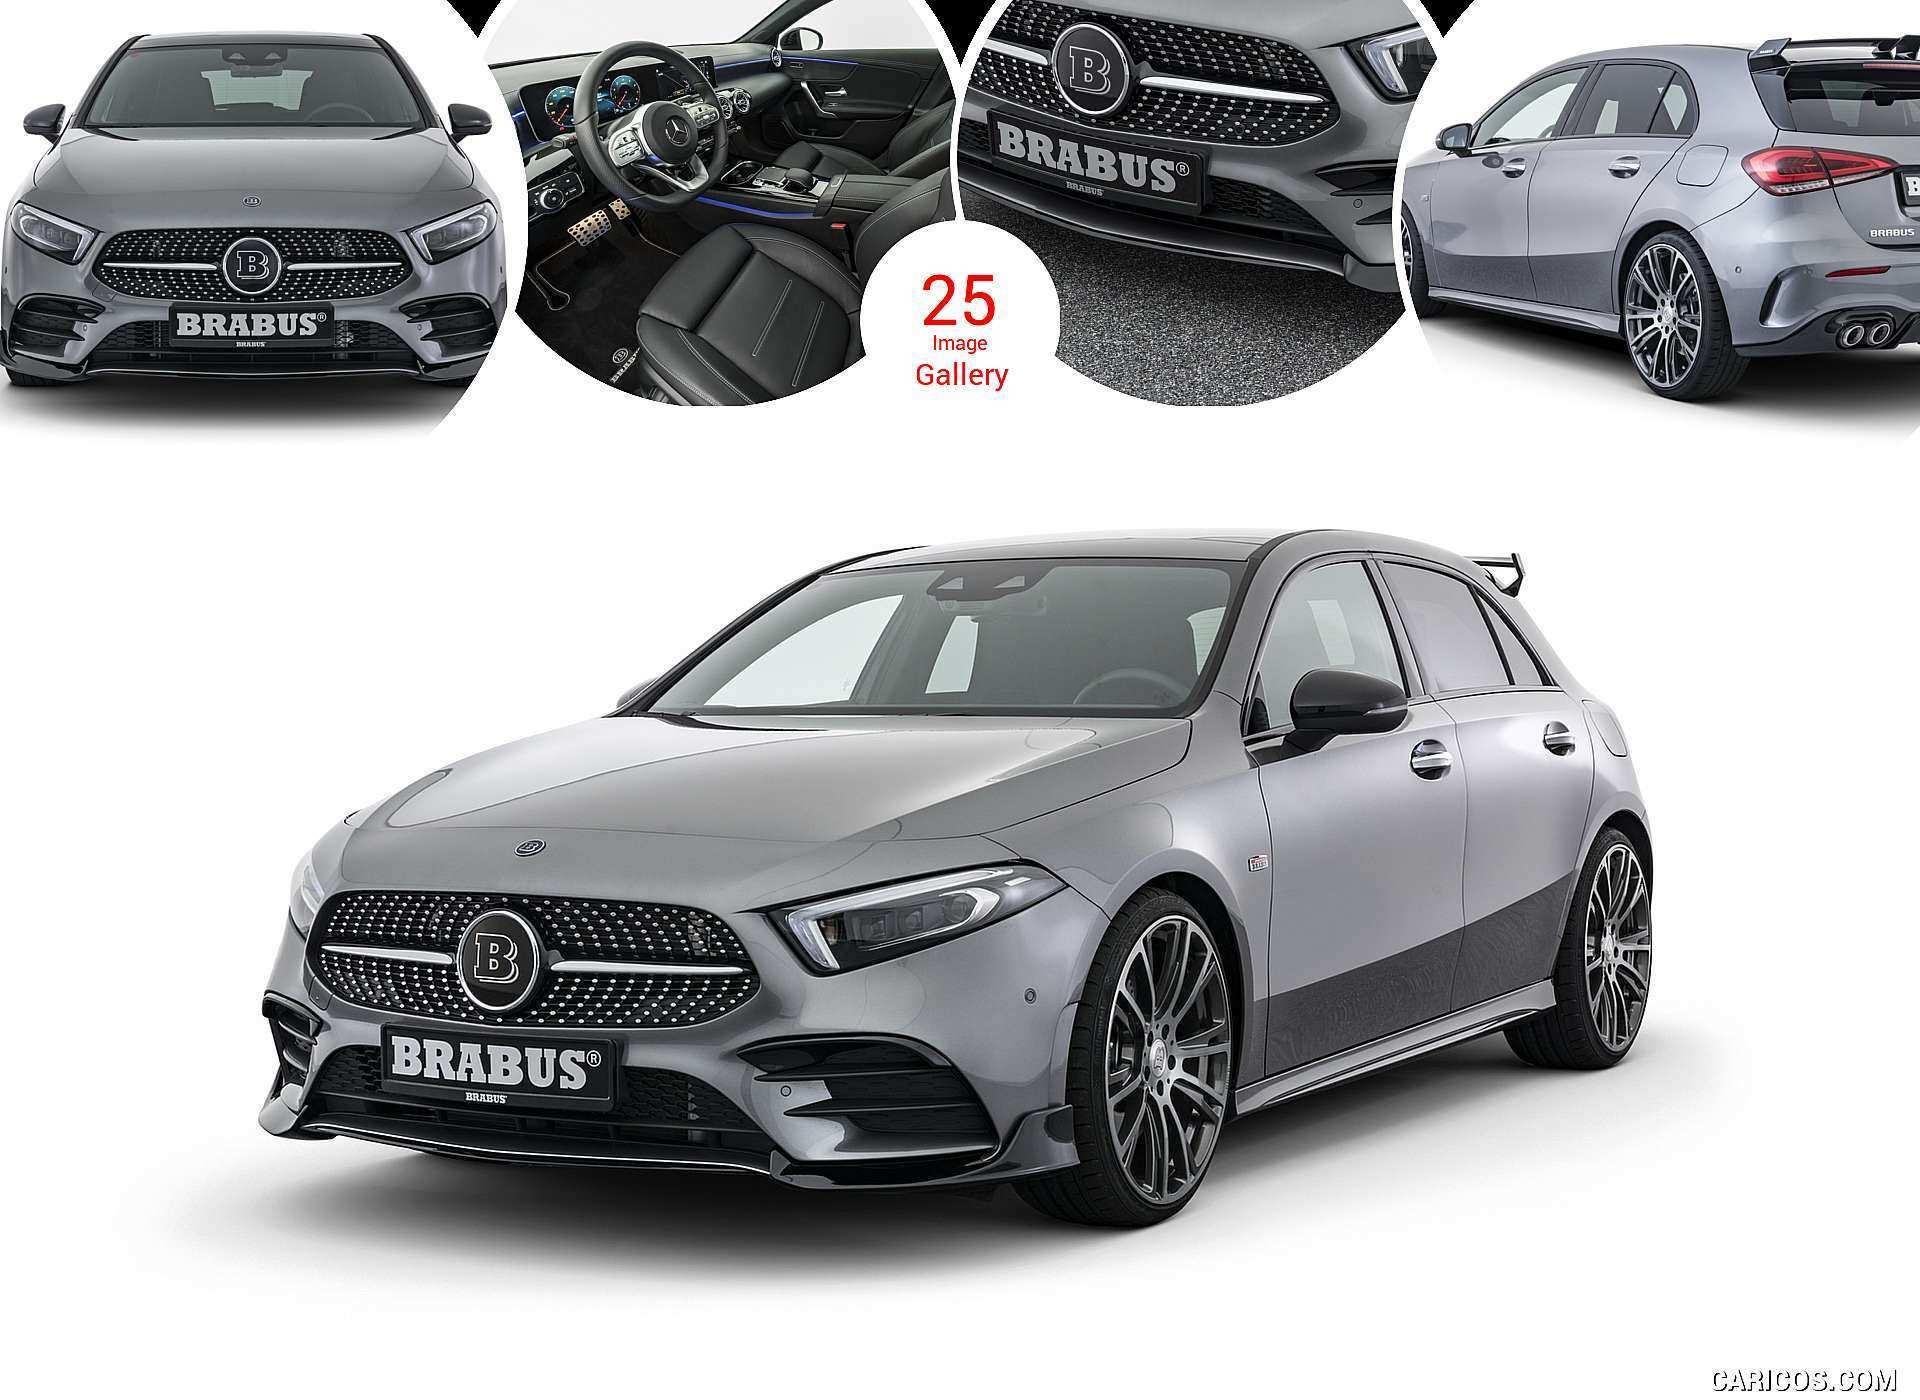 77 All New Mercedes Brabus 2020 Interior with Mercedes Brabus 2020